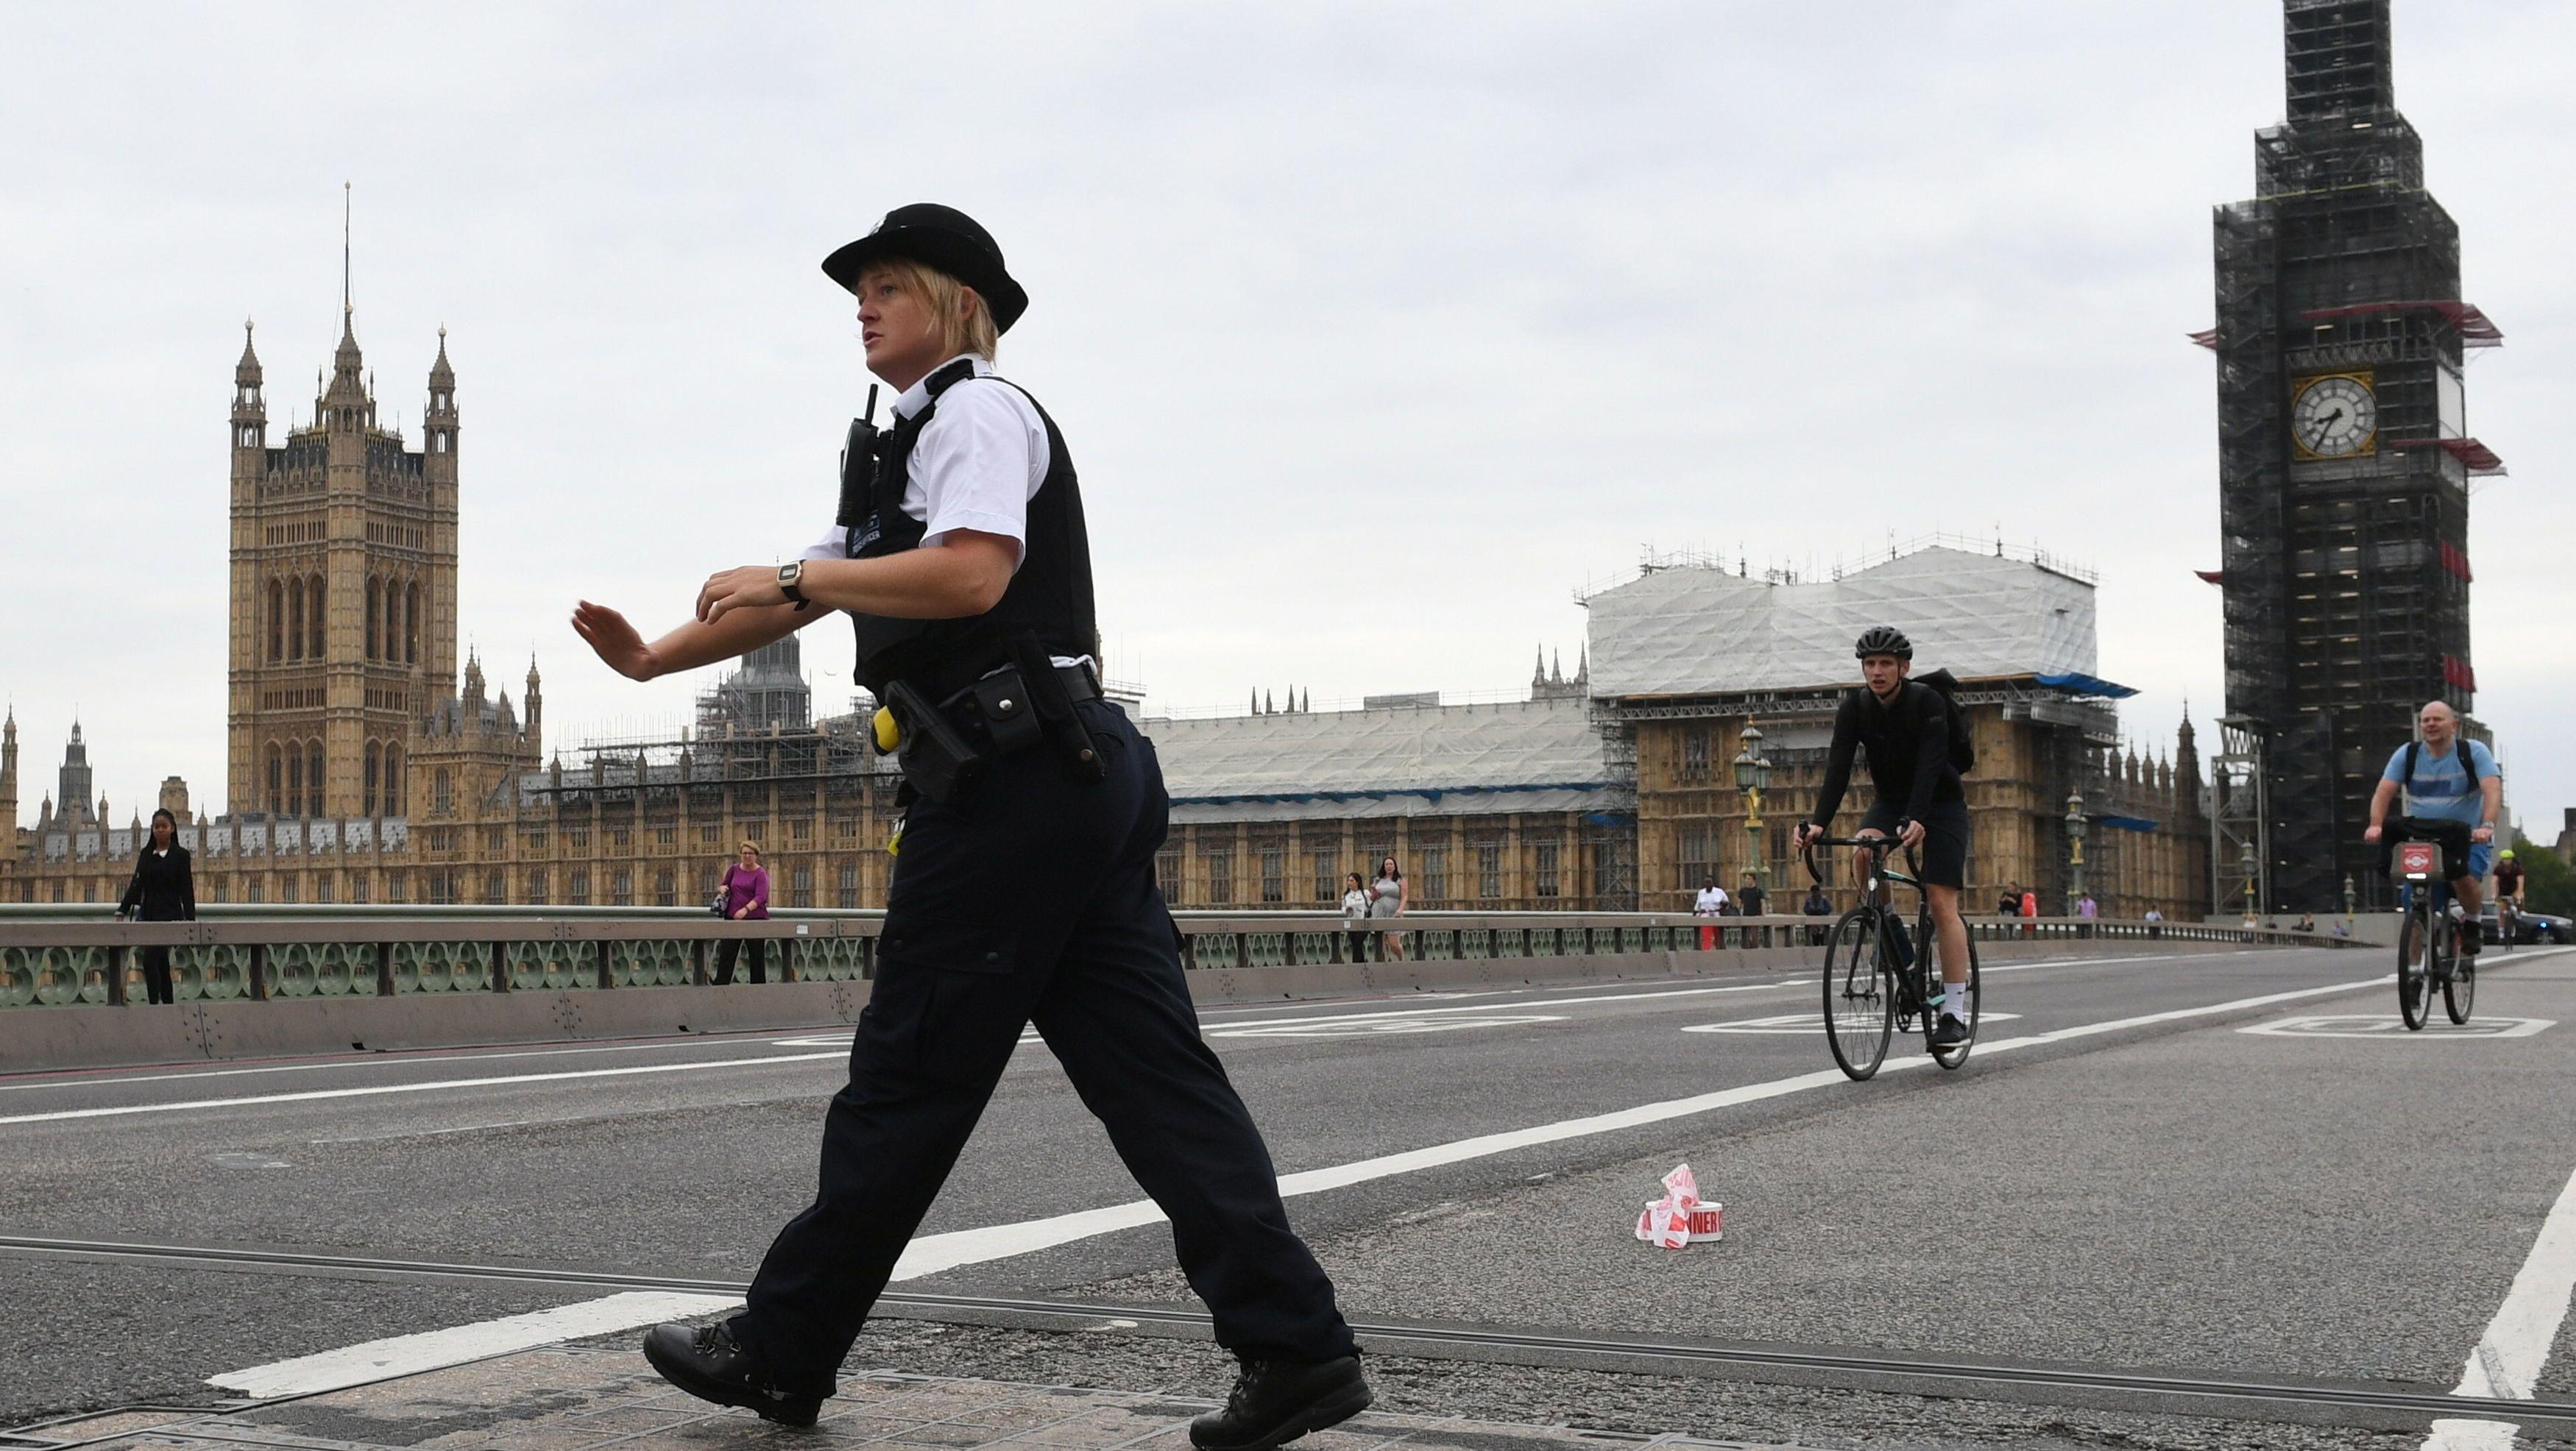 westminster car crash: latest updates - bbc news